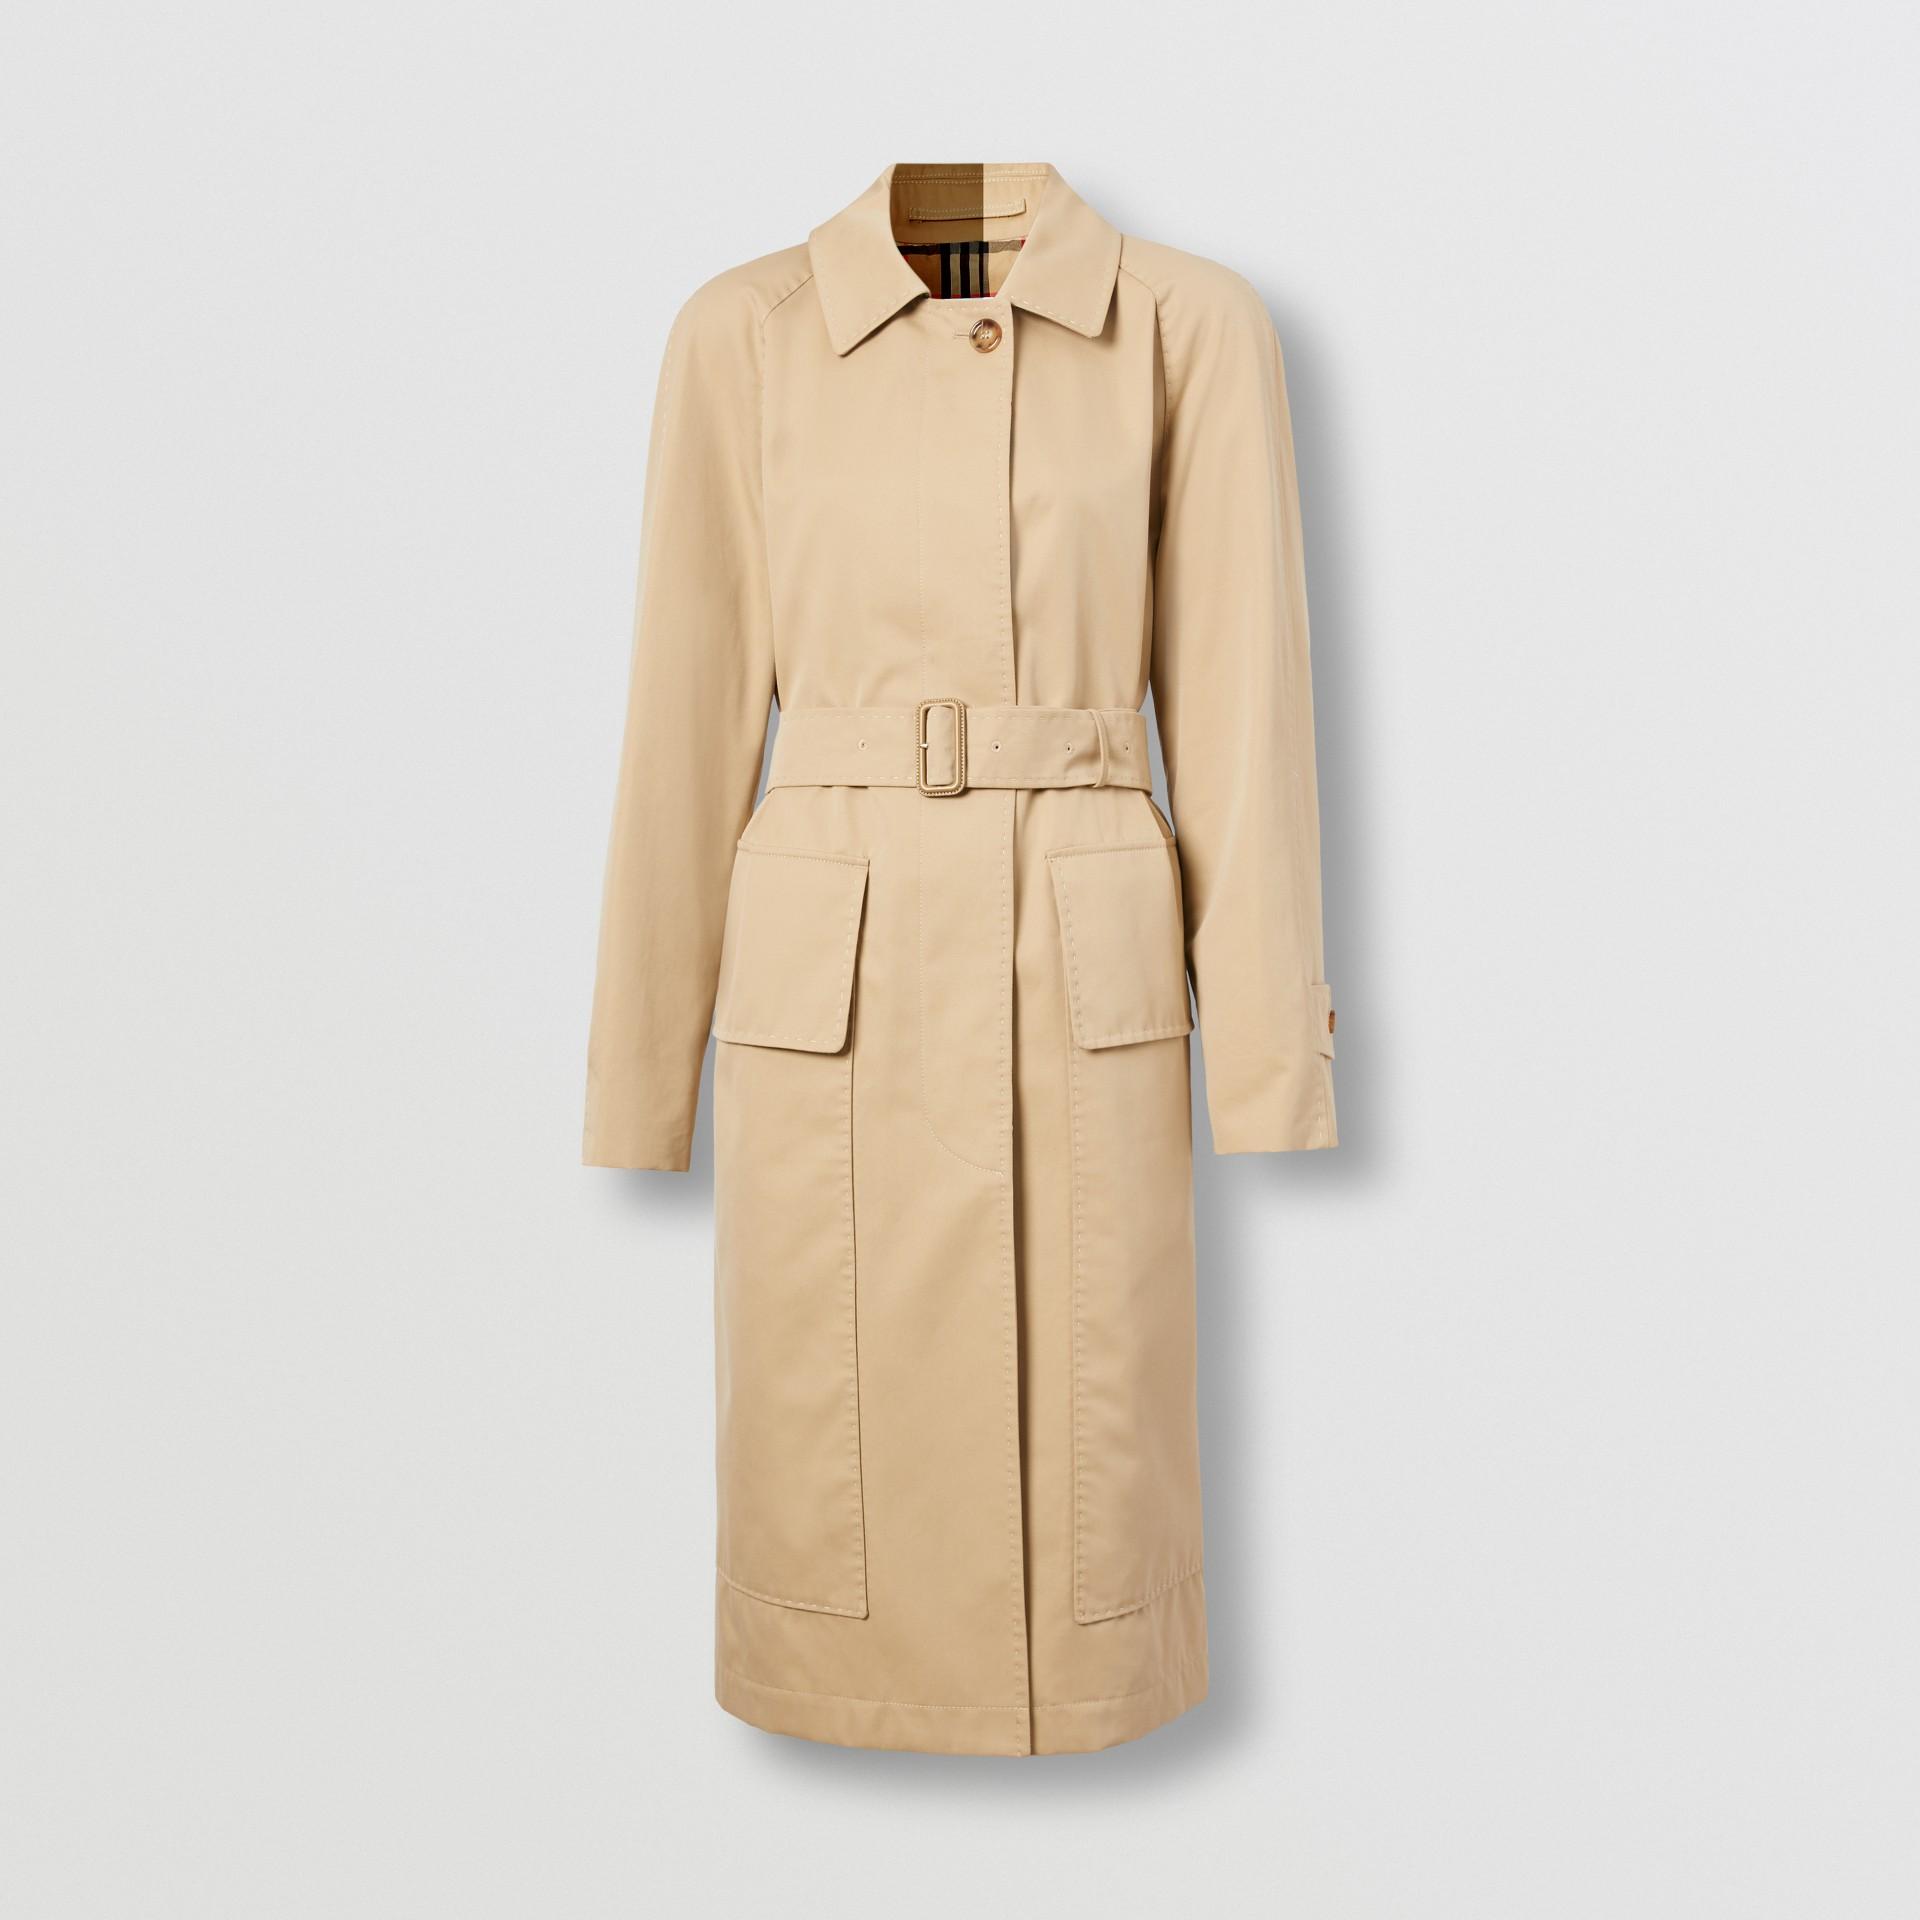 Cotton Gabardine Belted Car Coat in Honey - Women | Burberry - gallery image 3